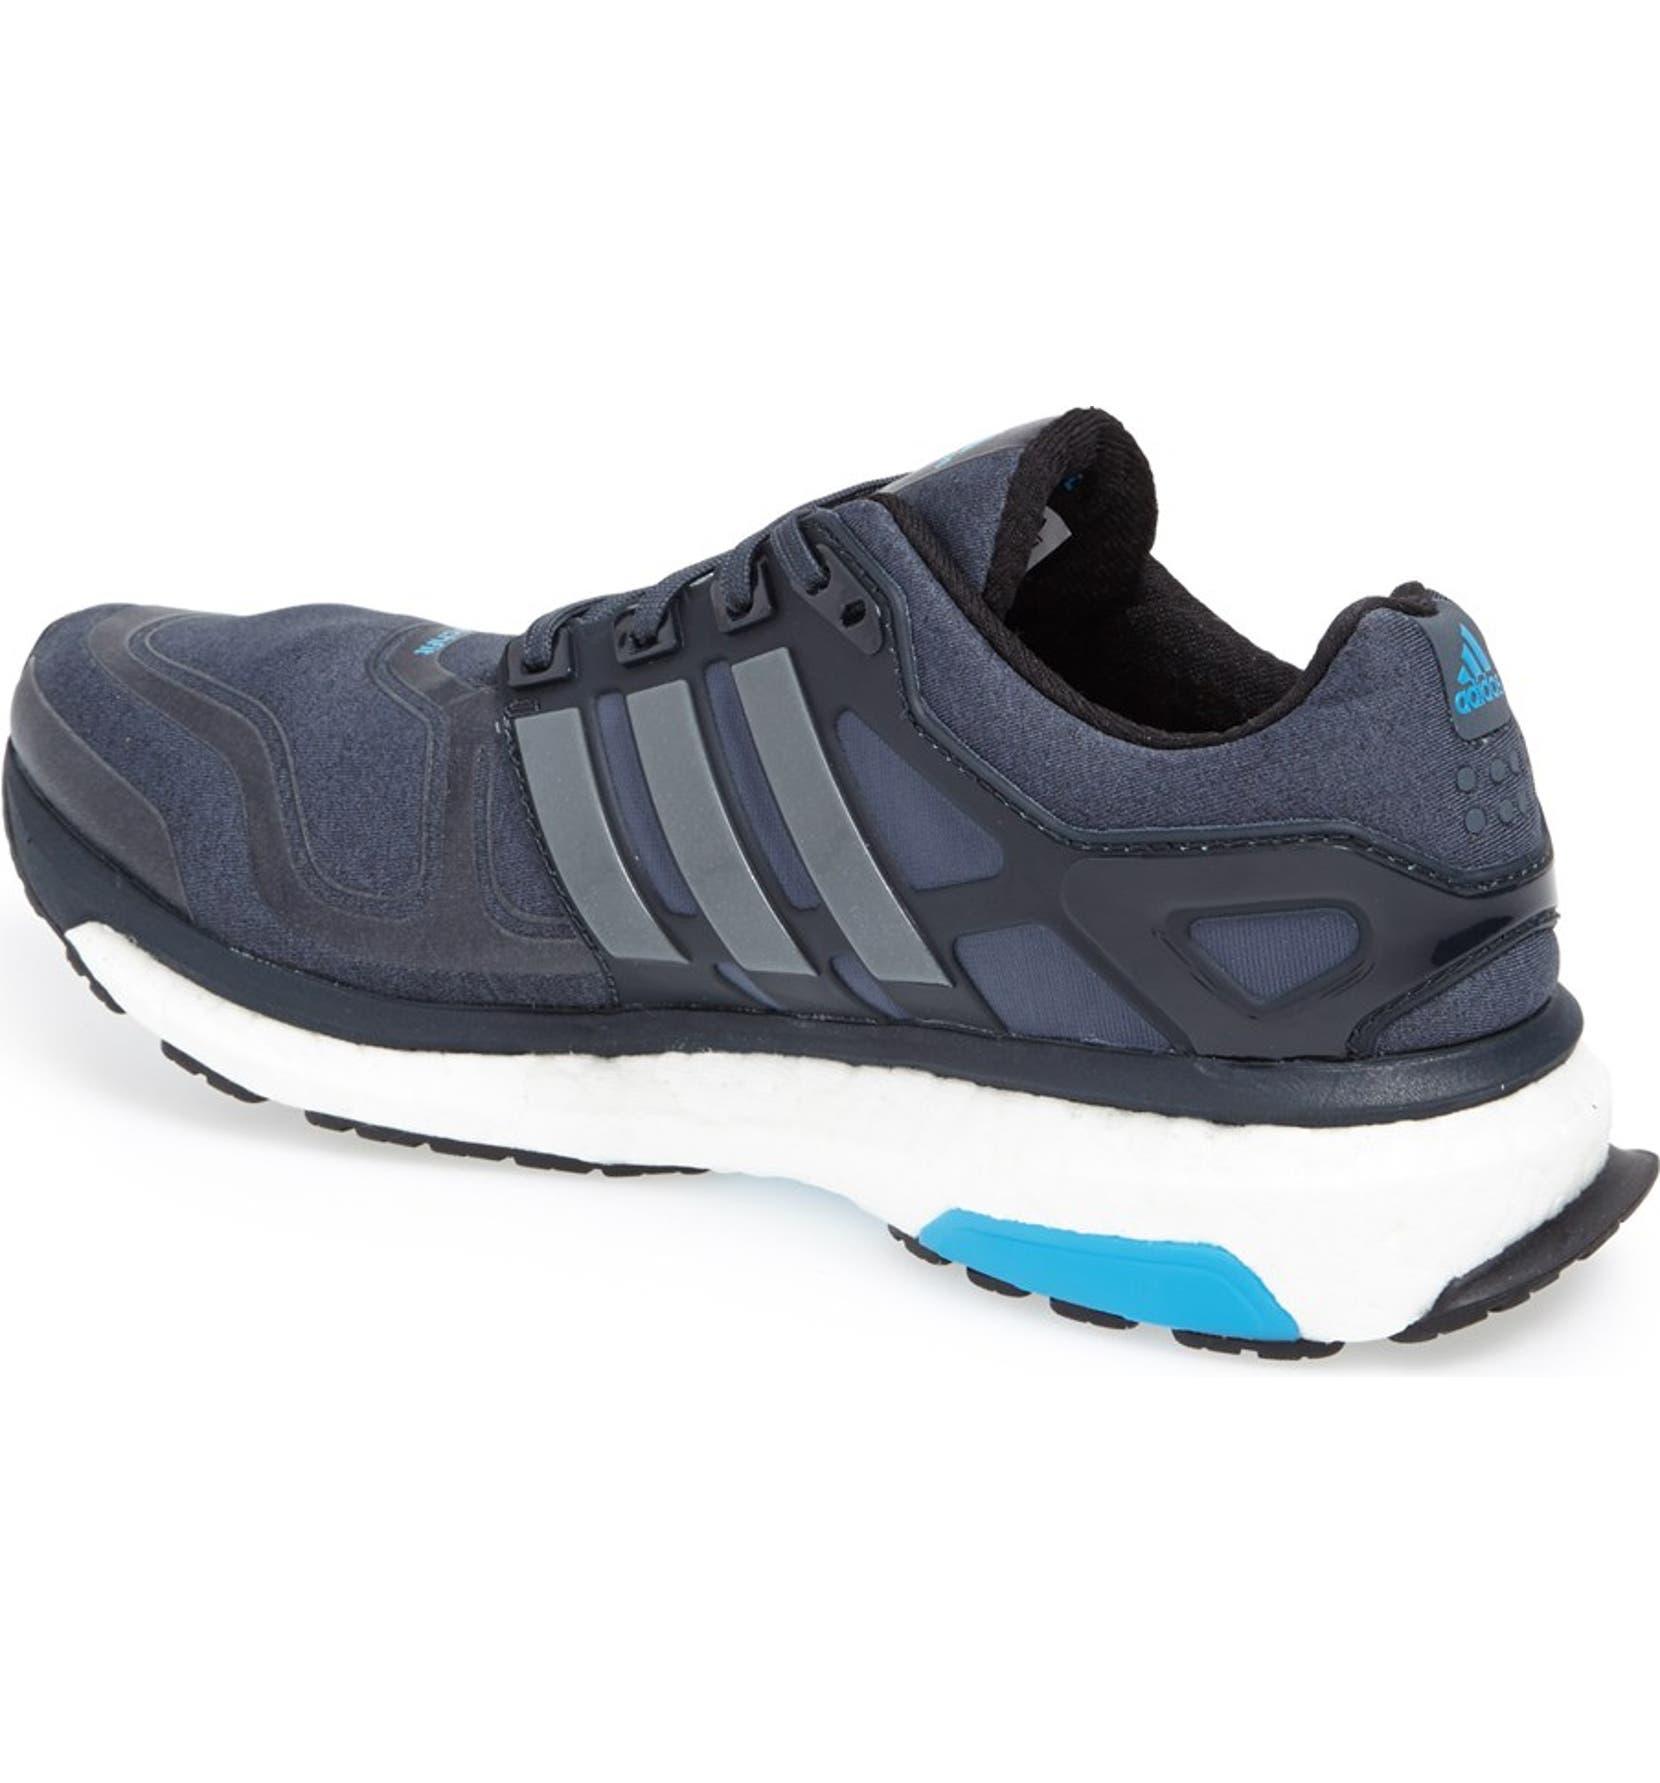 online retailer 802c6 2fbd3 adidas Energy Boost 2 Running Shoe (Women)  Nordstrom